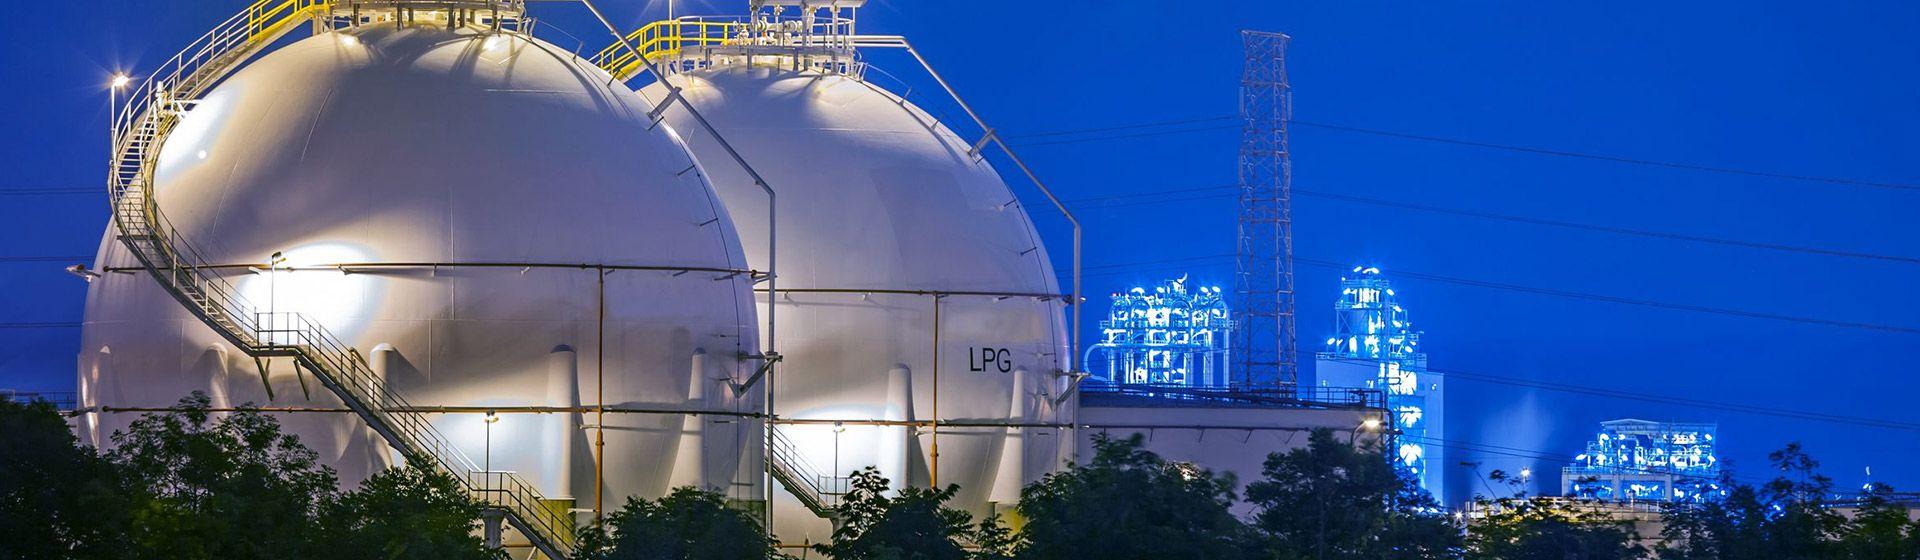 Modular Gas Plants Oil Refinery Crude Oil Gas